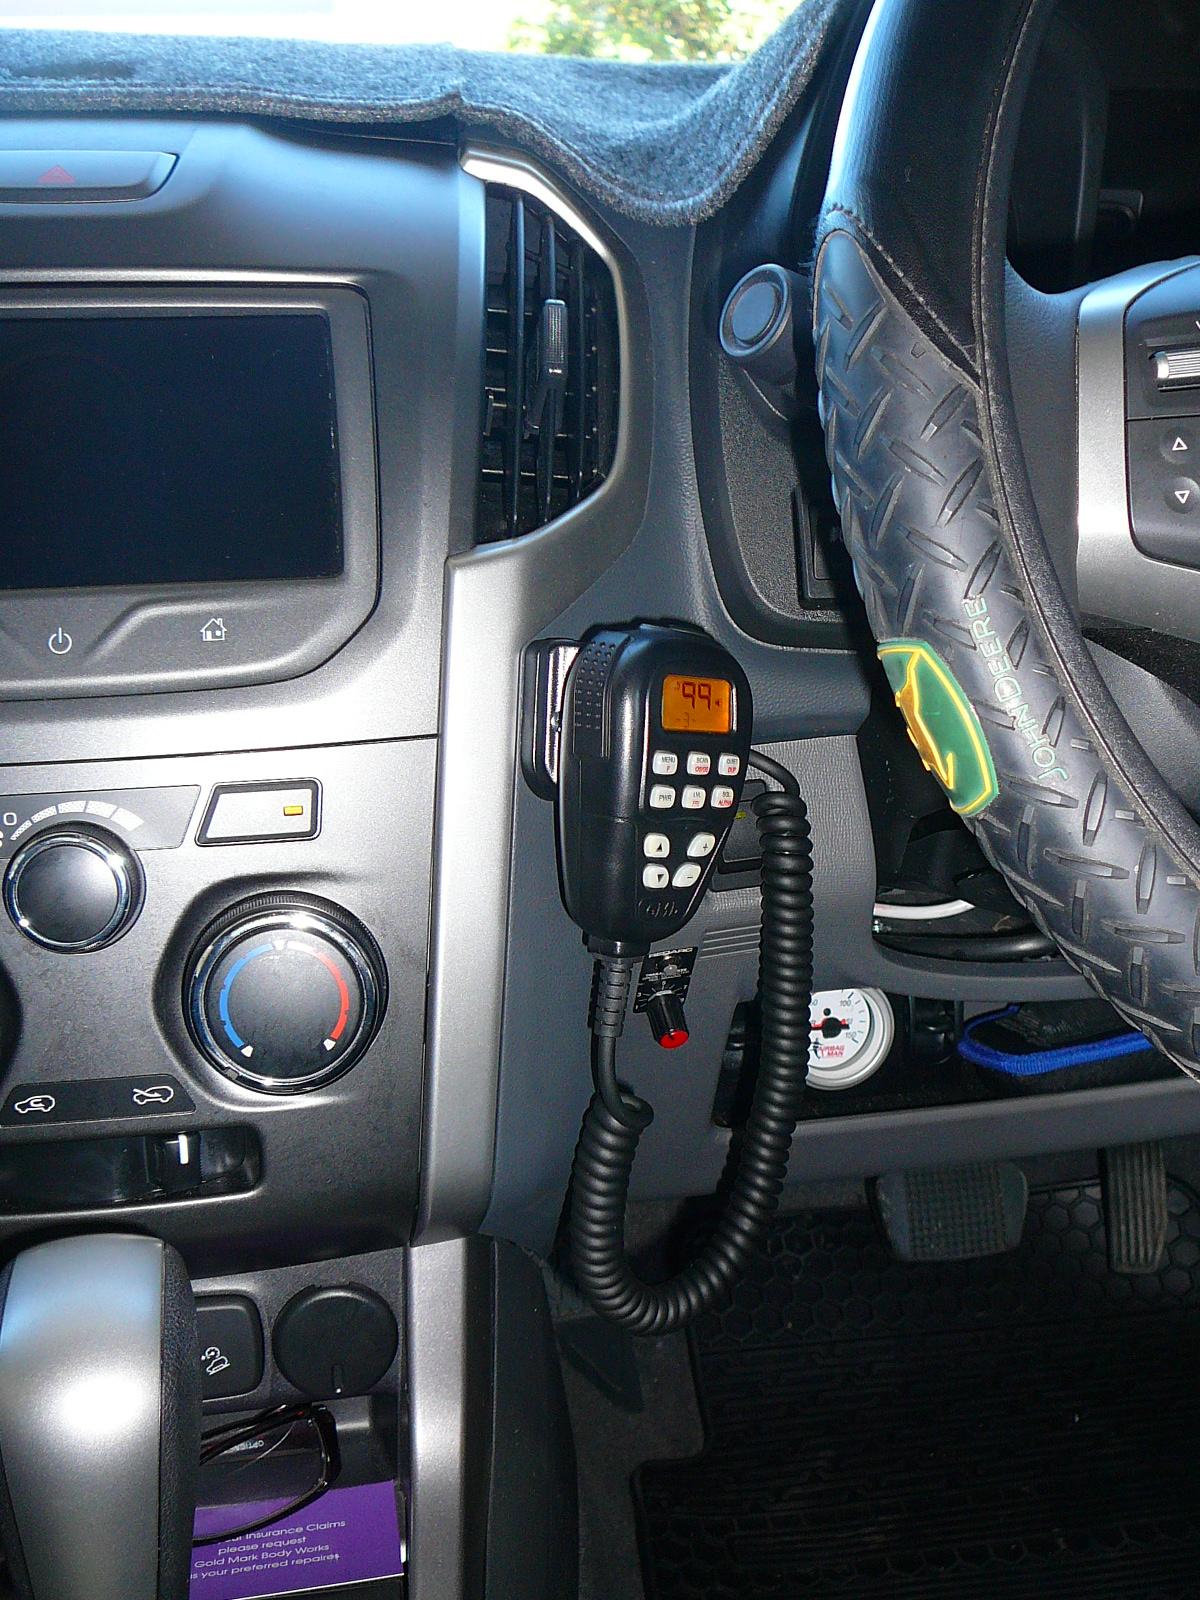 Holden Colorado 2013, GME TX3540 UHF CB Radio Installation